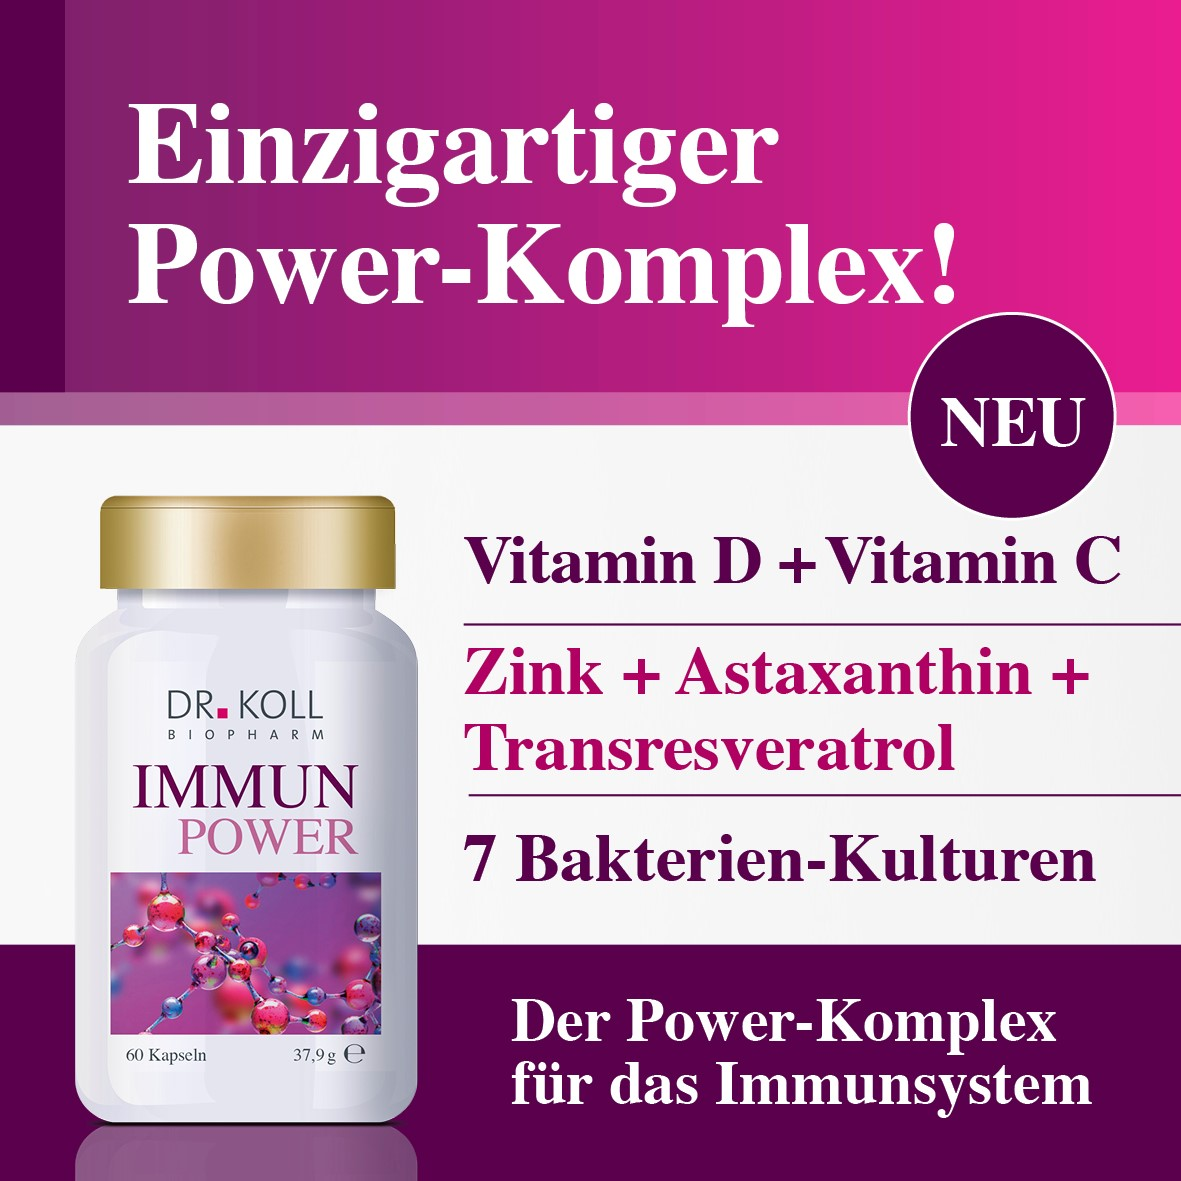 Immun Power Dr.Koll